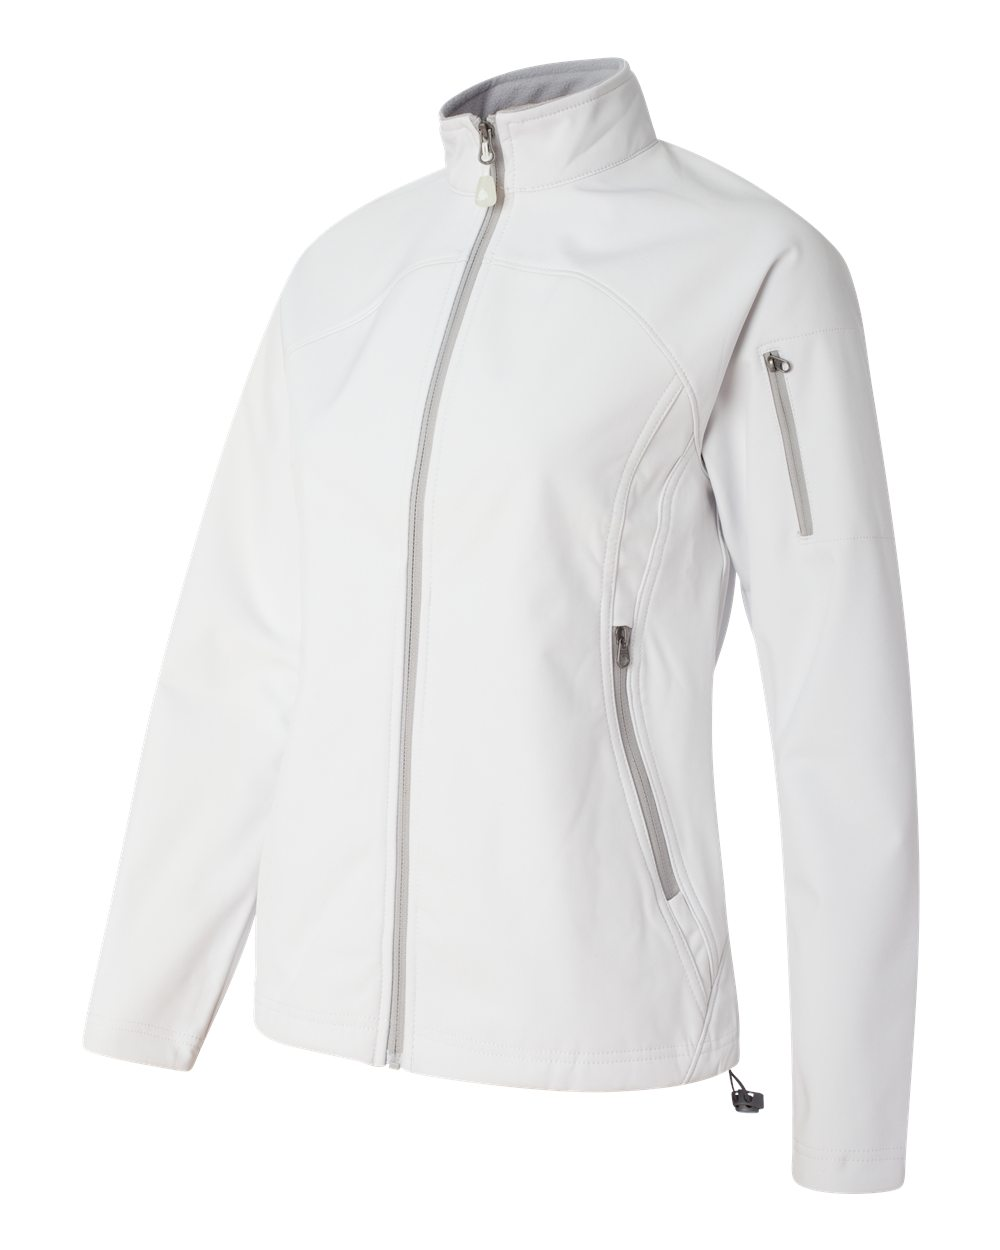 Colorado Clothing - Ladies' Soft Shell Jacket